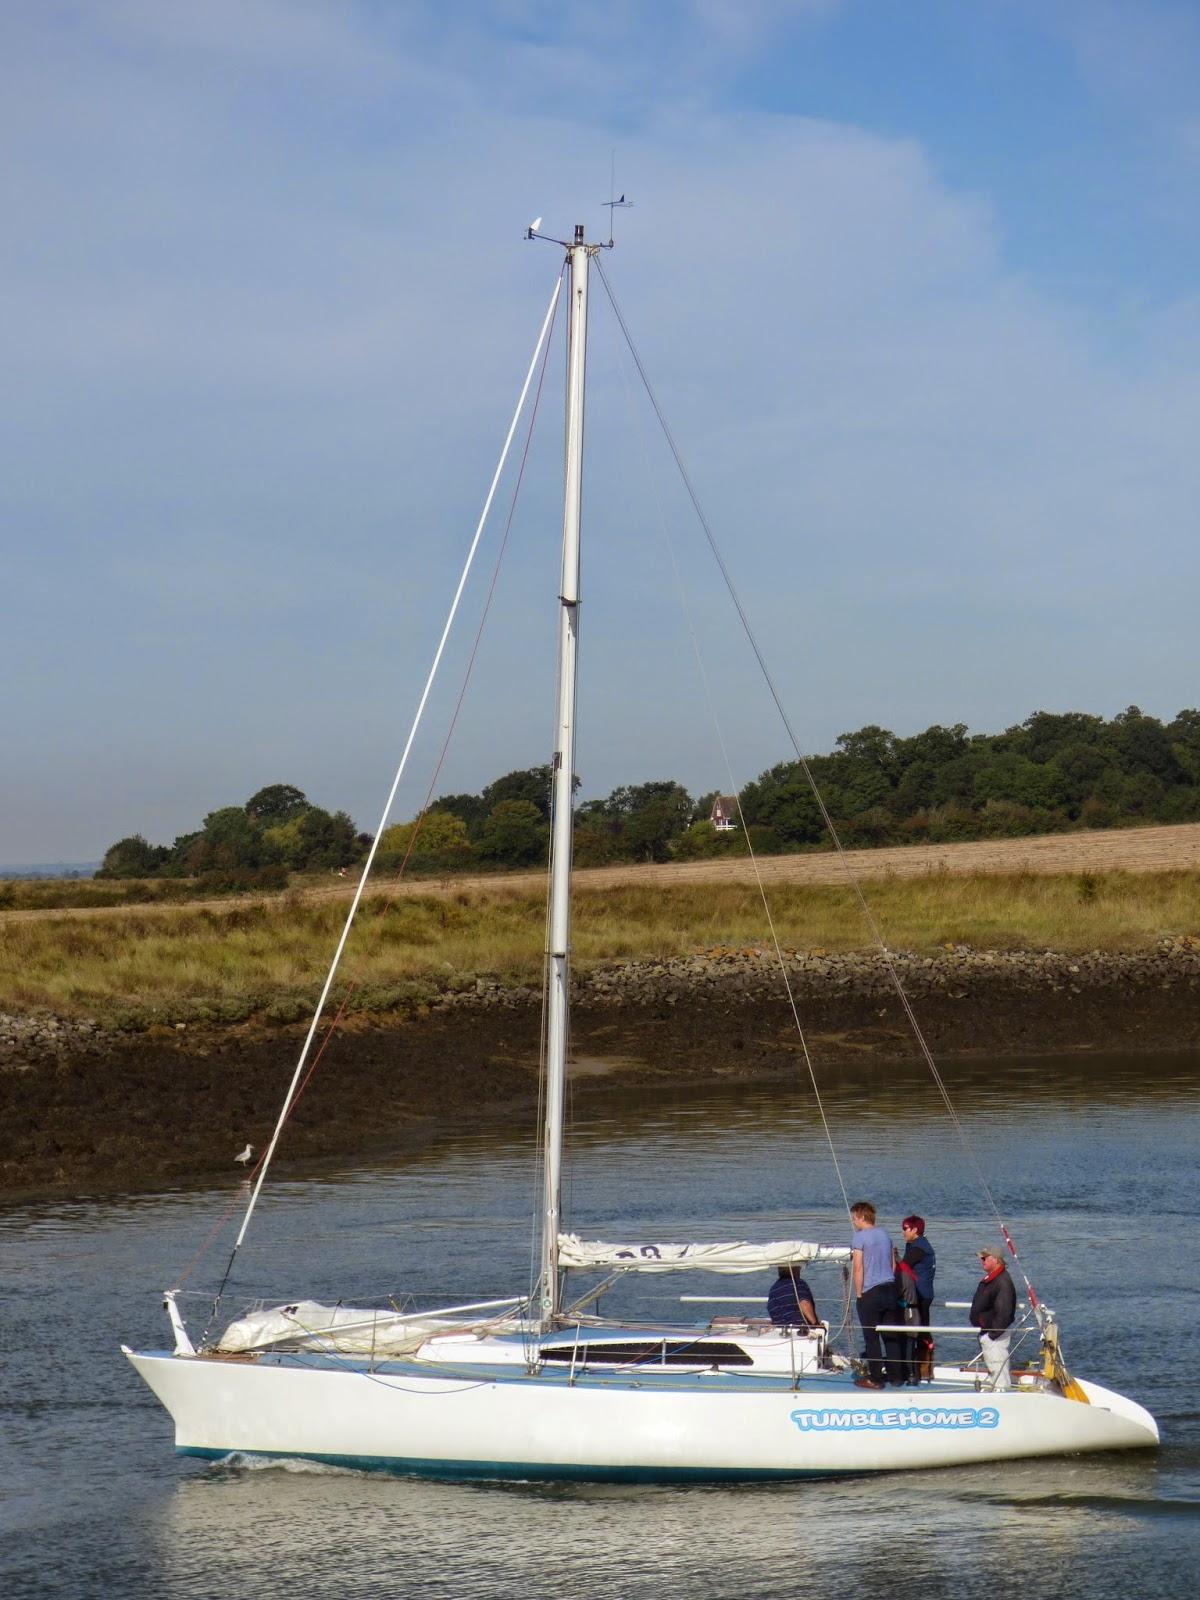 Shockwave40: Tumblehome 2   Stephen Jones Designed Half Ton IOR Yacht    Burnham Week 2014